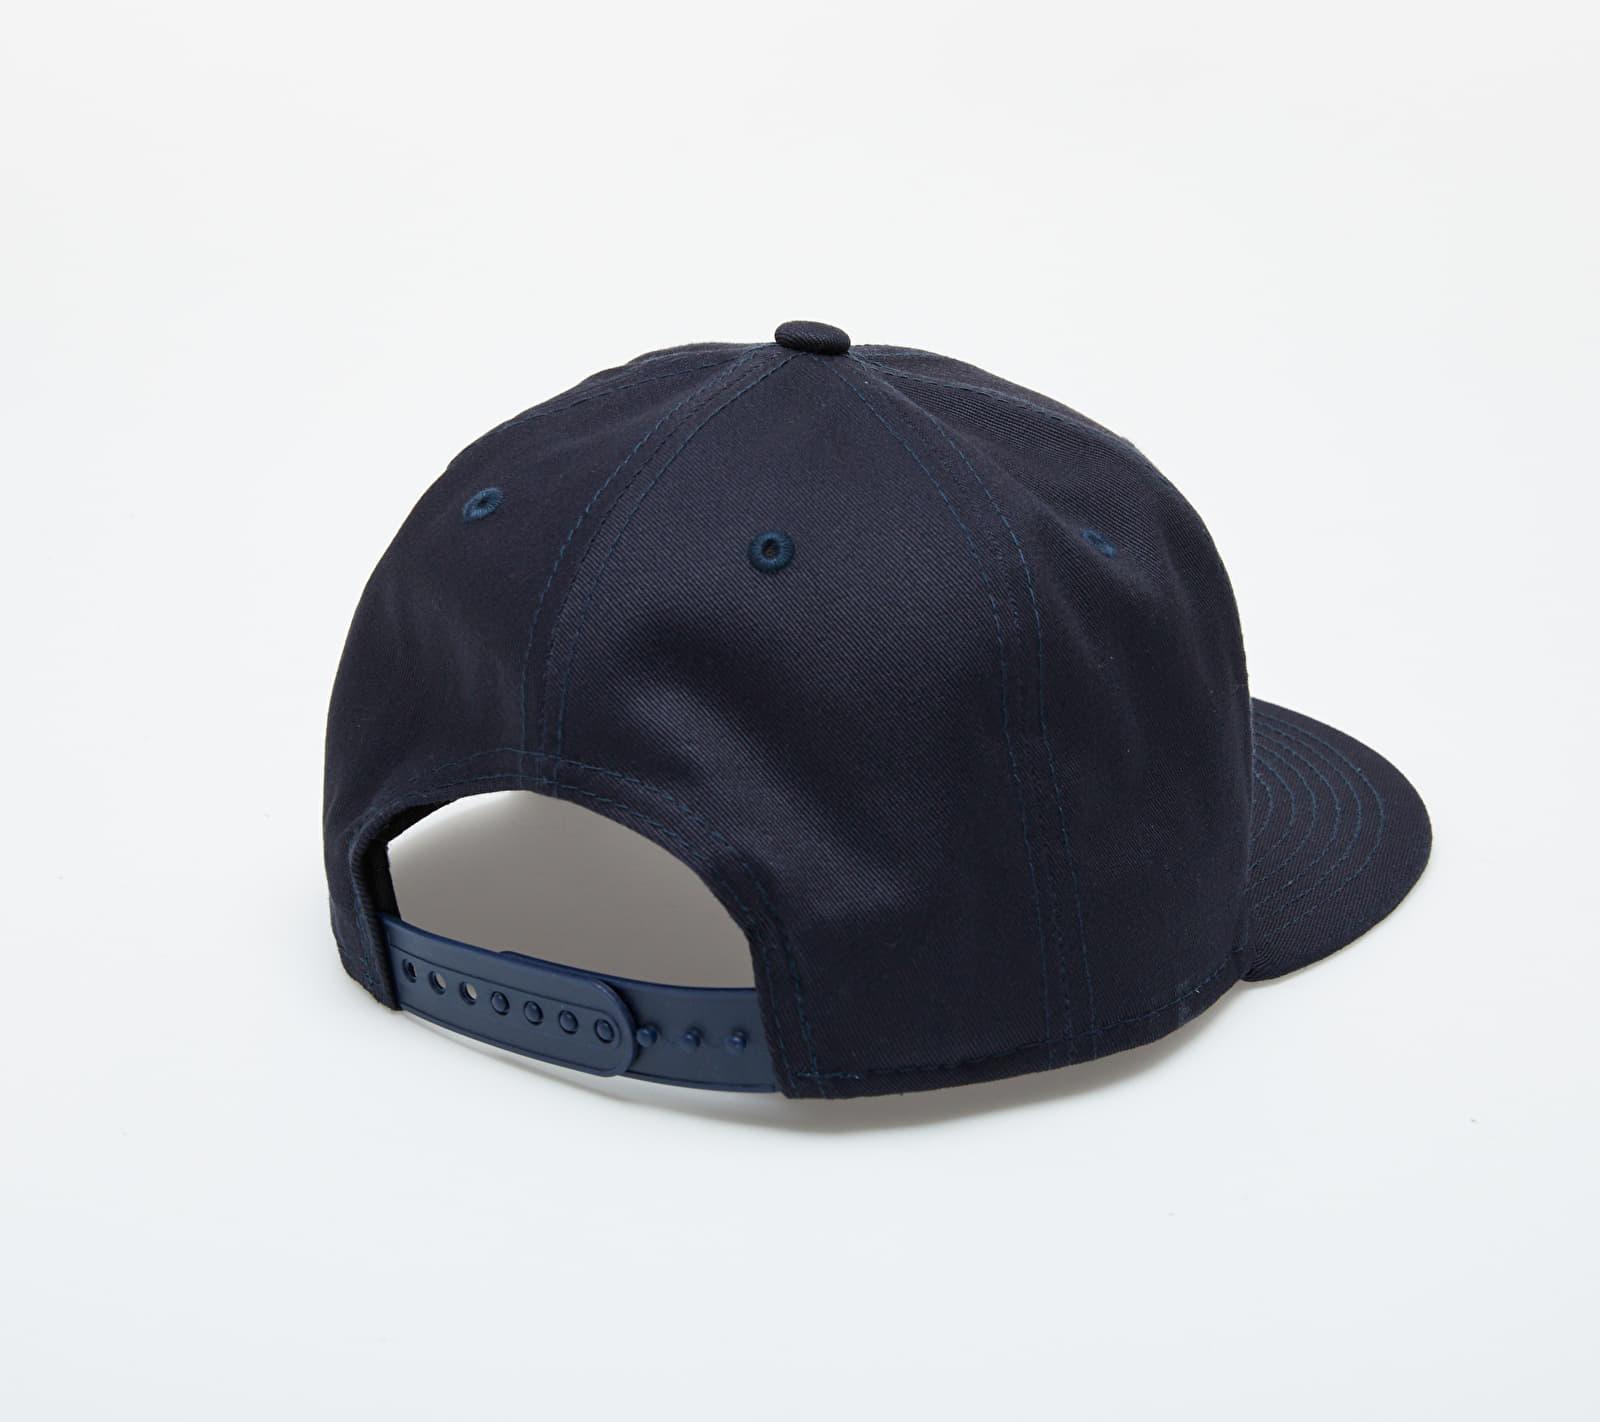 New Era 9Fifty MLB League Essential New York Yankees Cap Navy, Blue